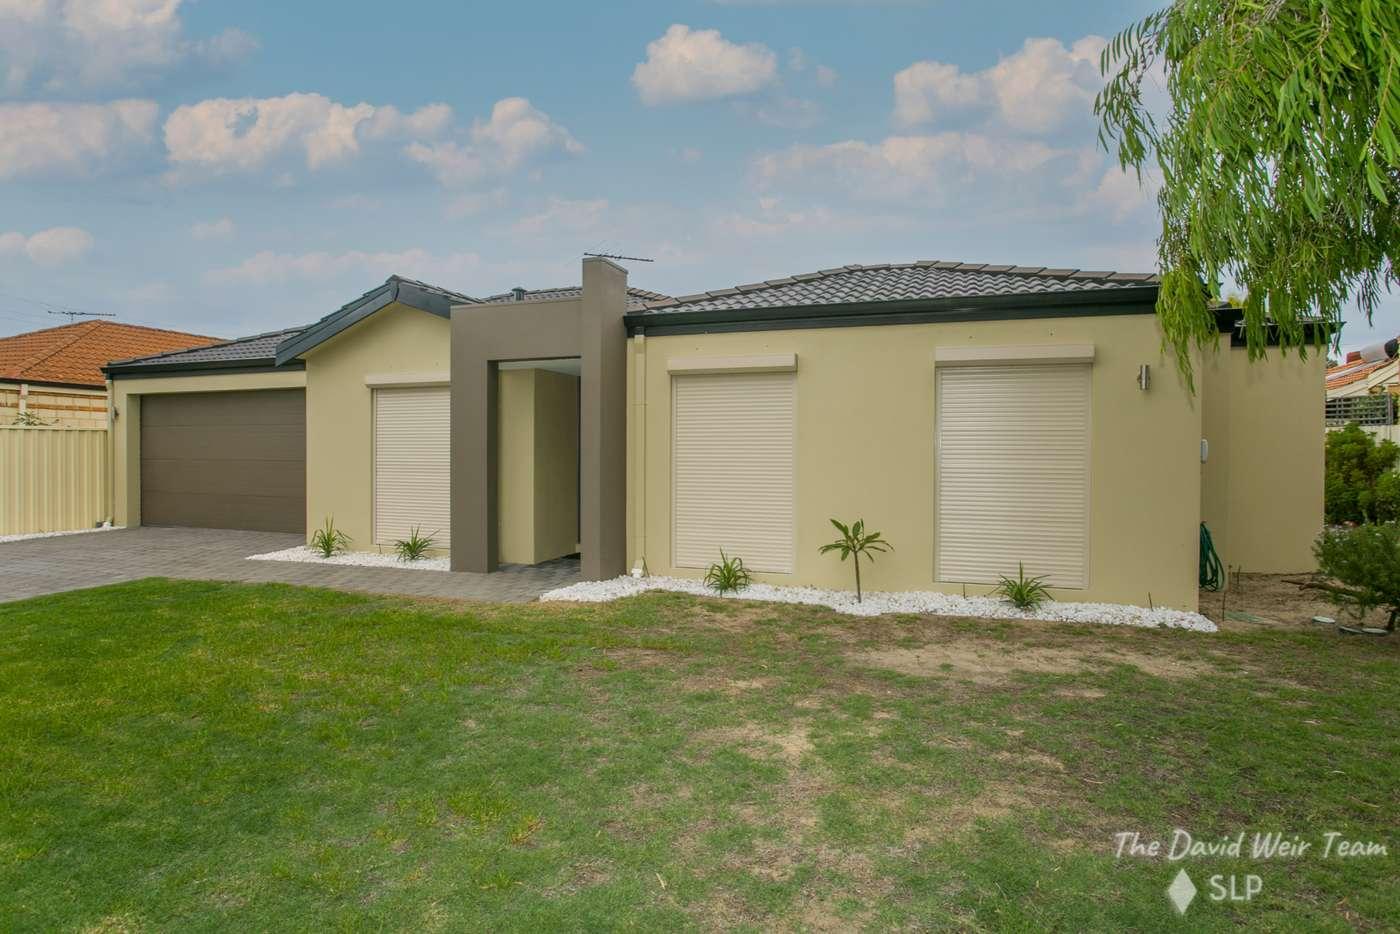 Main view of Homely house listing, 22A Maltarra Street, Nollamara WA 6061